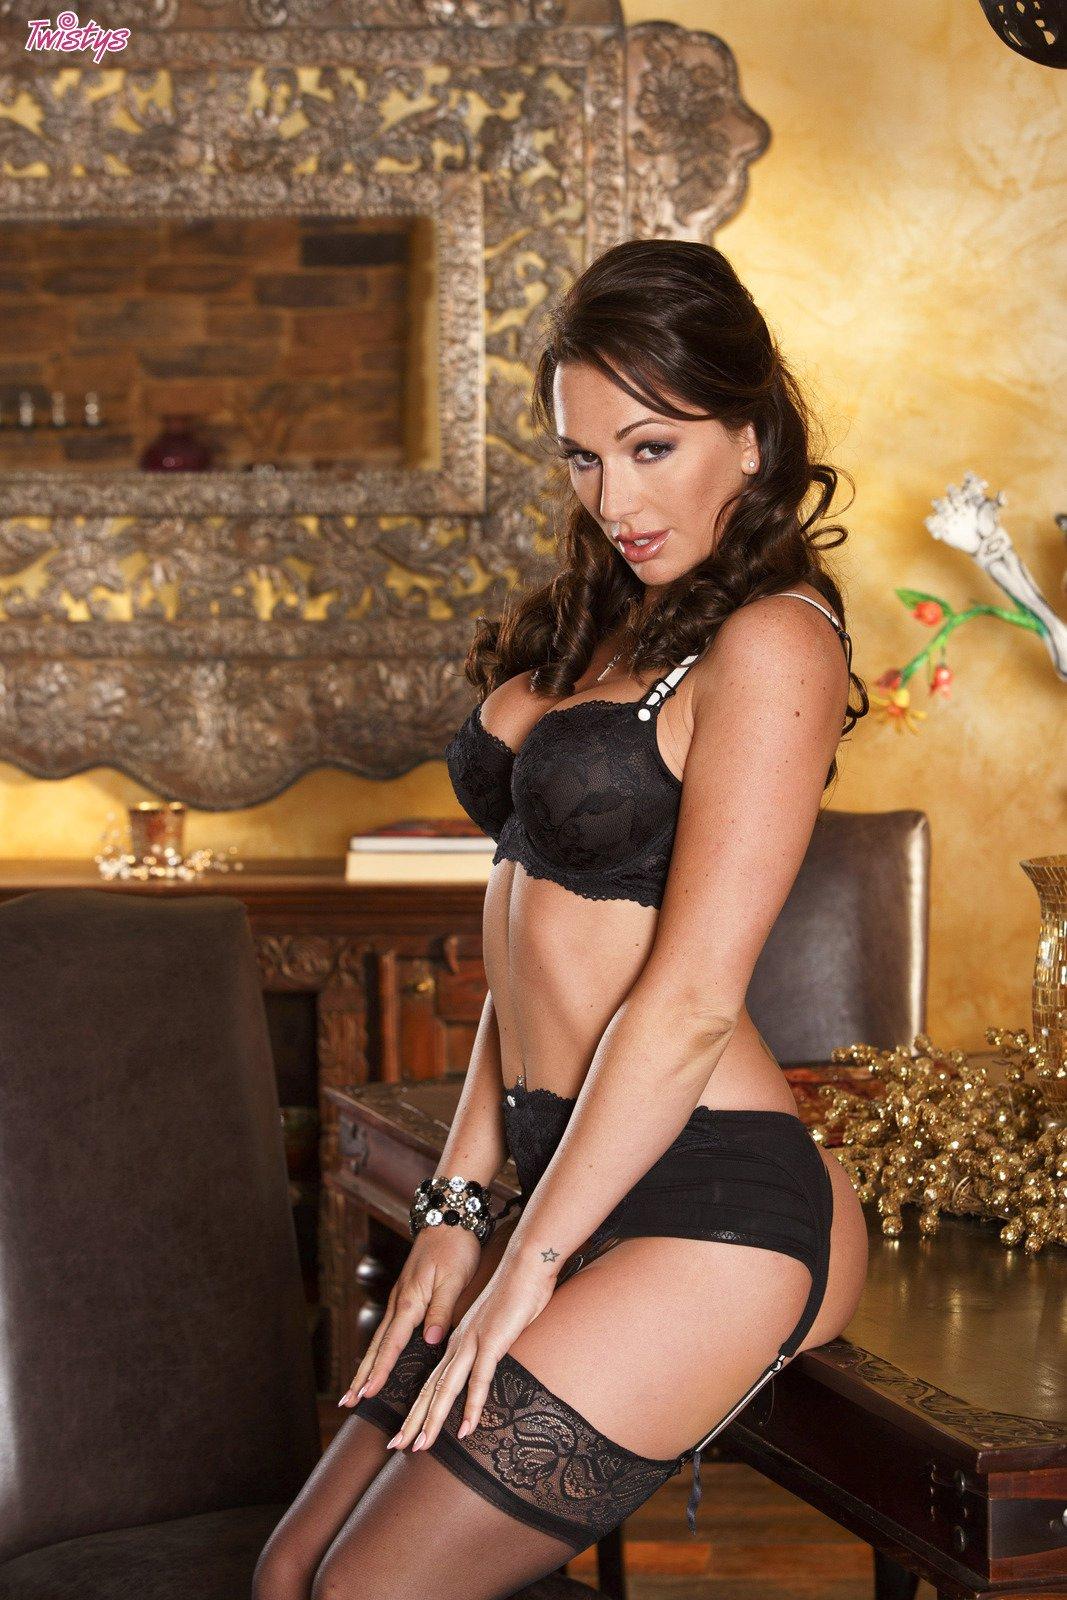 anal hot sex woman